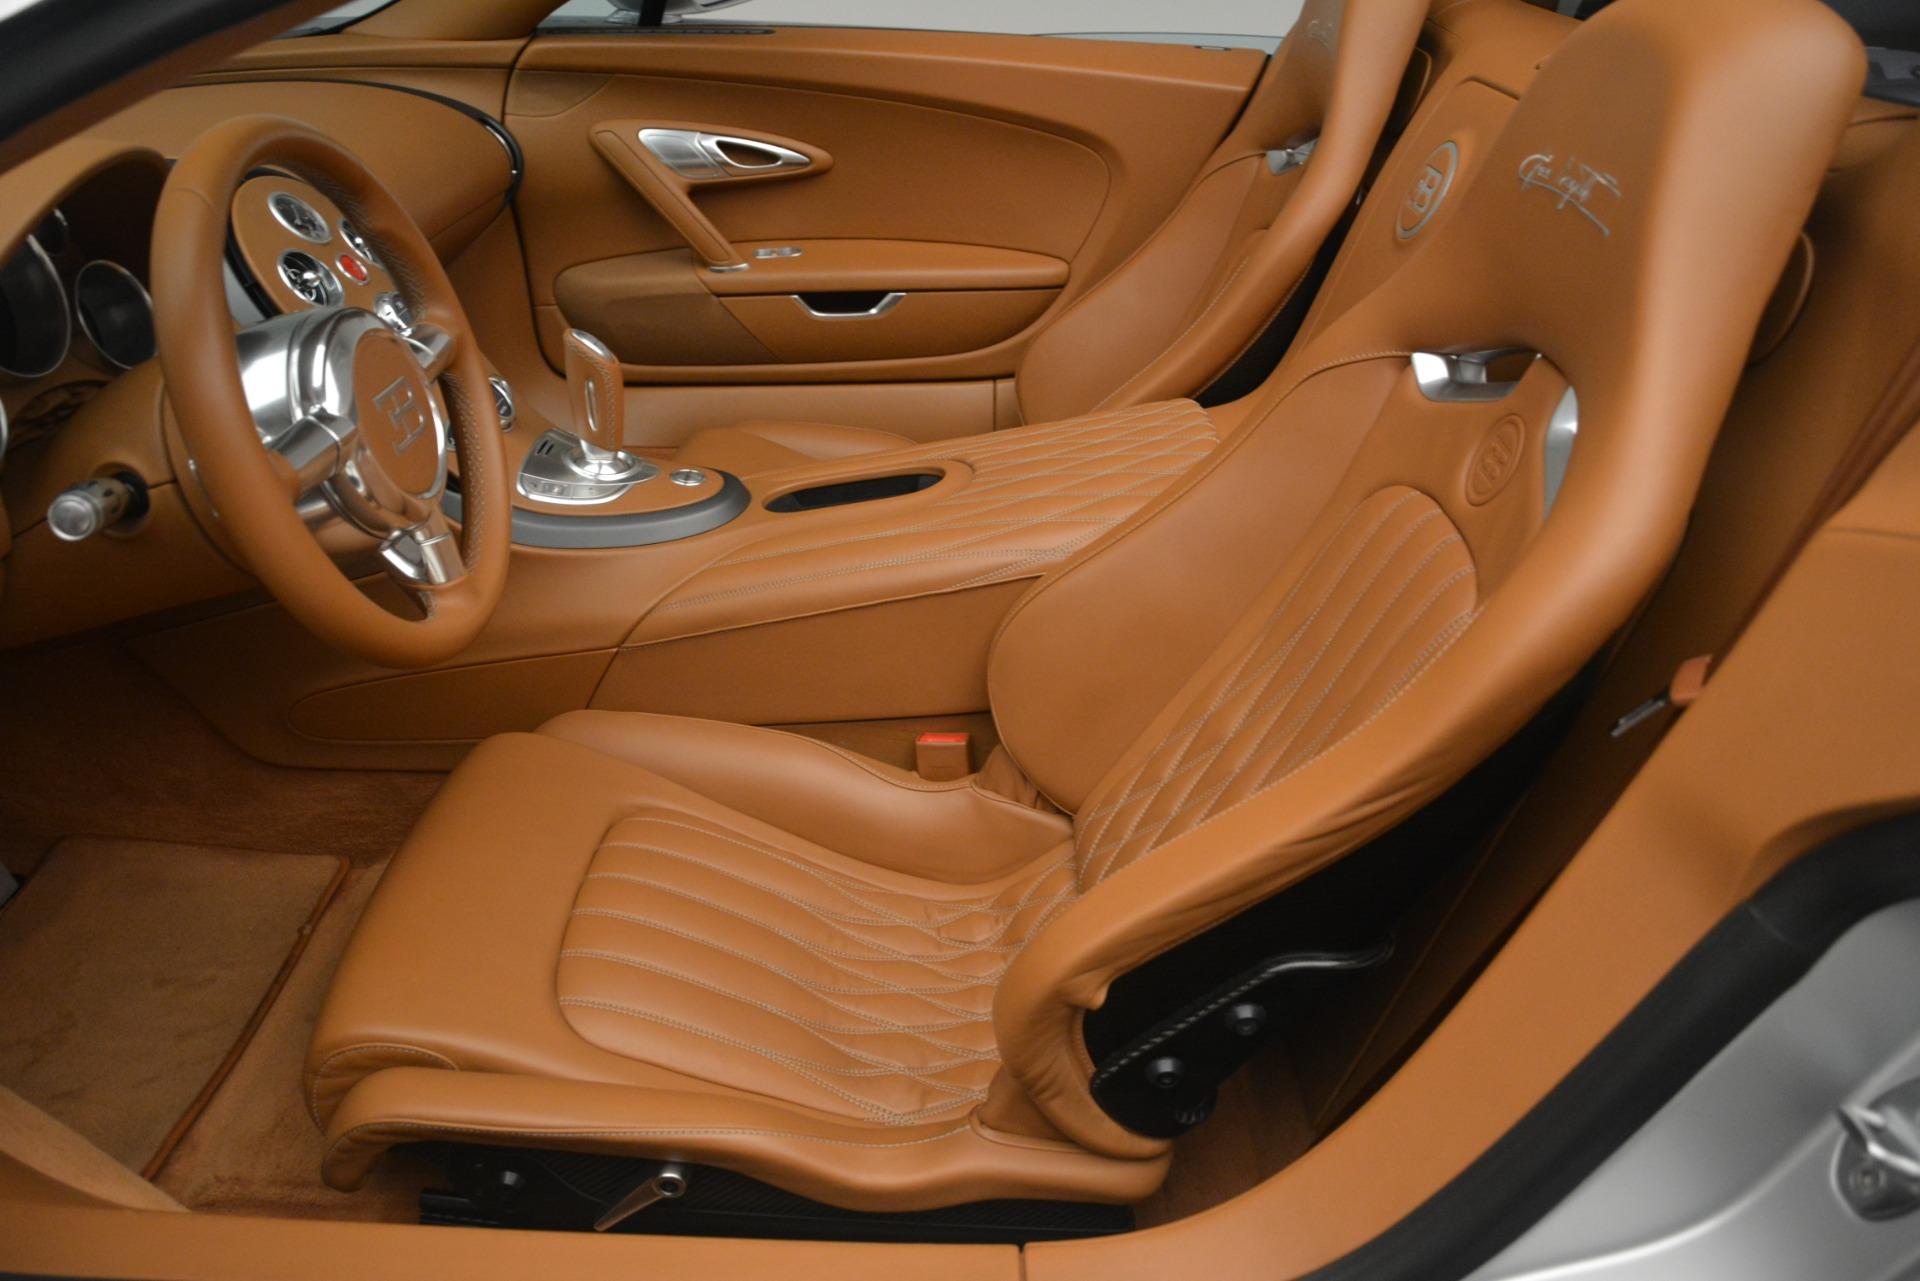 Used 2010 Bugatti Veyron 16.4 Grand Sport For Sale In Greenwich, CT 3159_p24